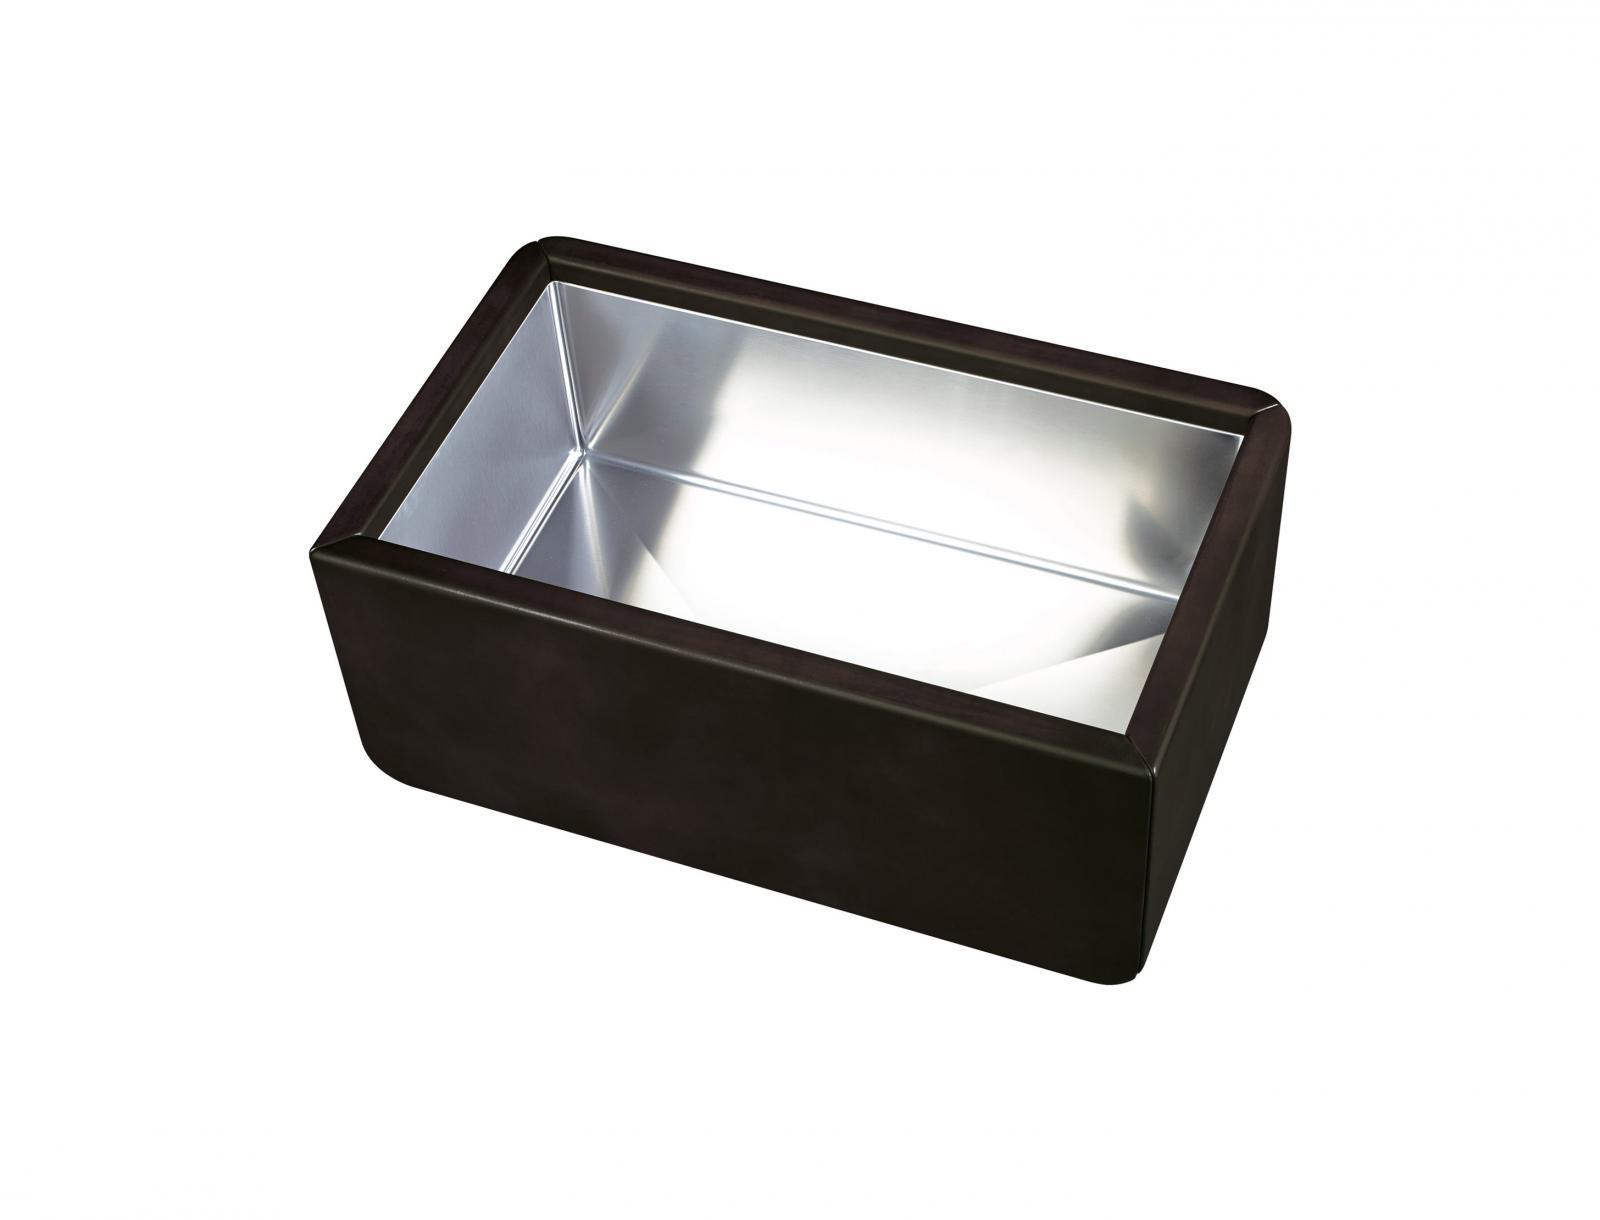 High-quality sink Dagobert black - single bowl, leather - 1